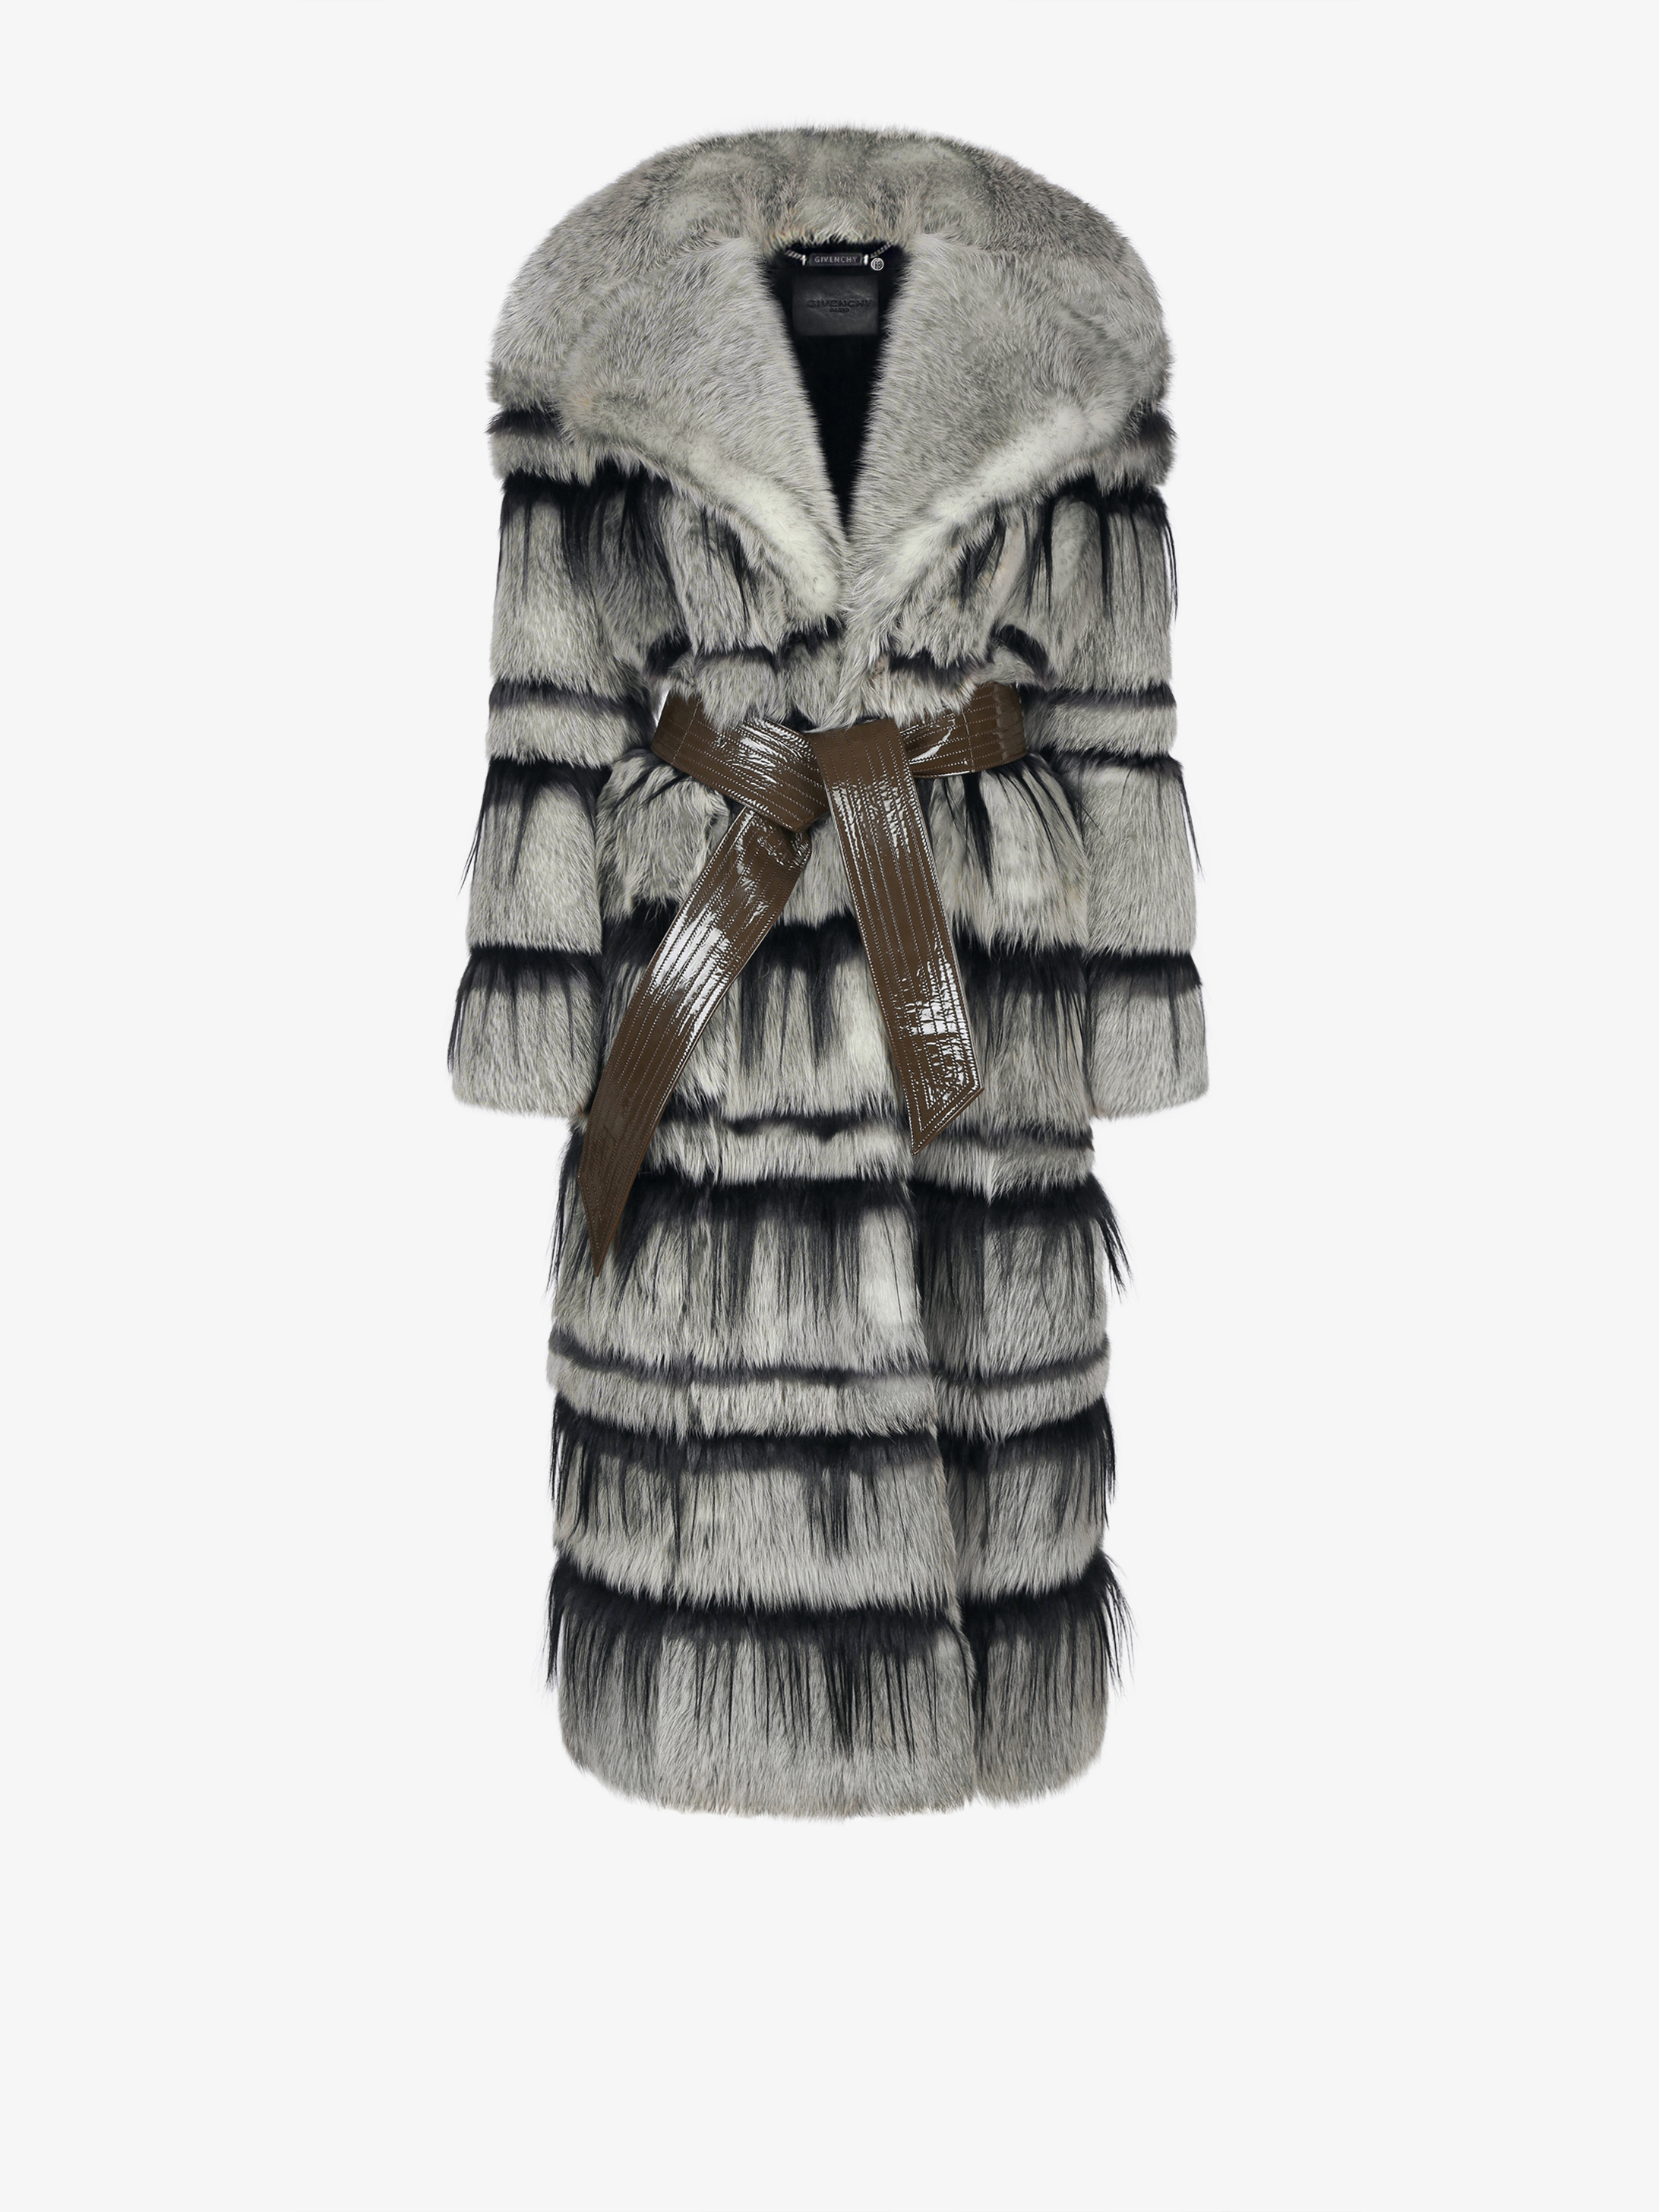 Coat in shearling